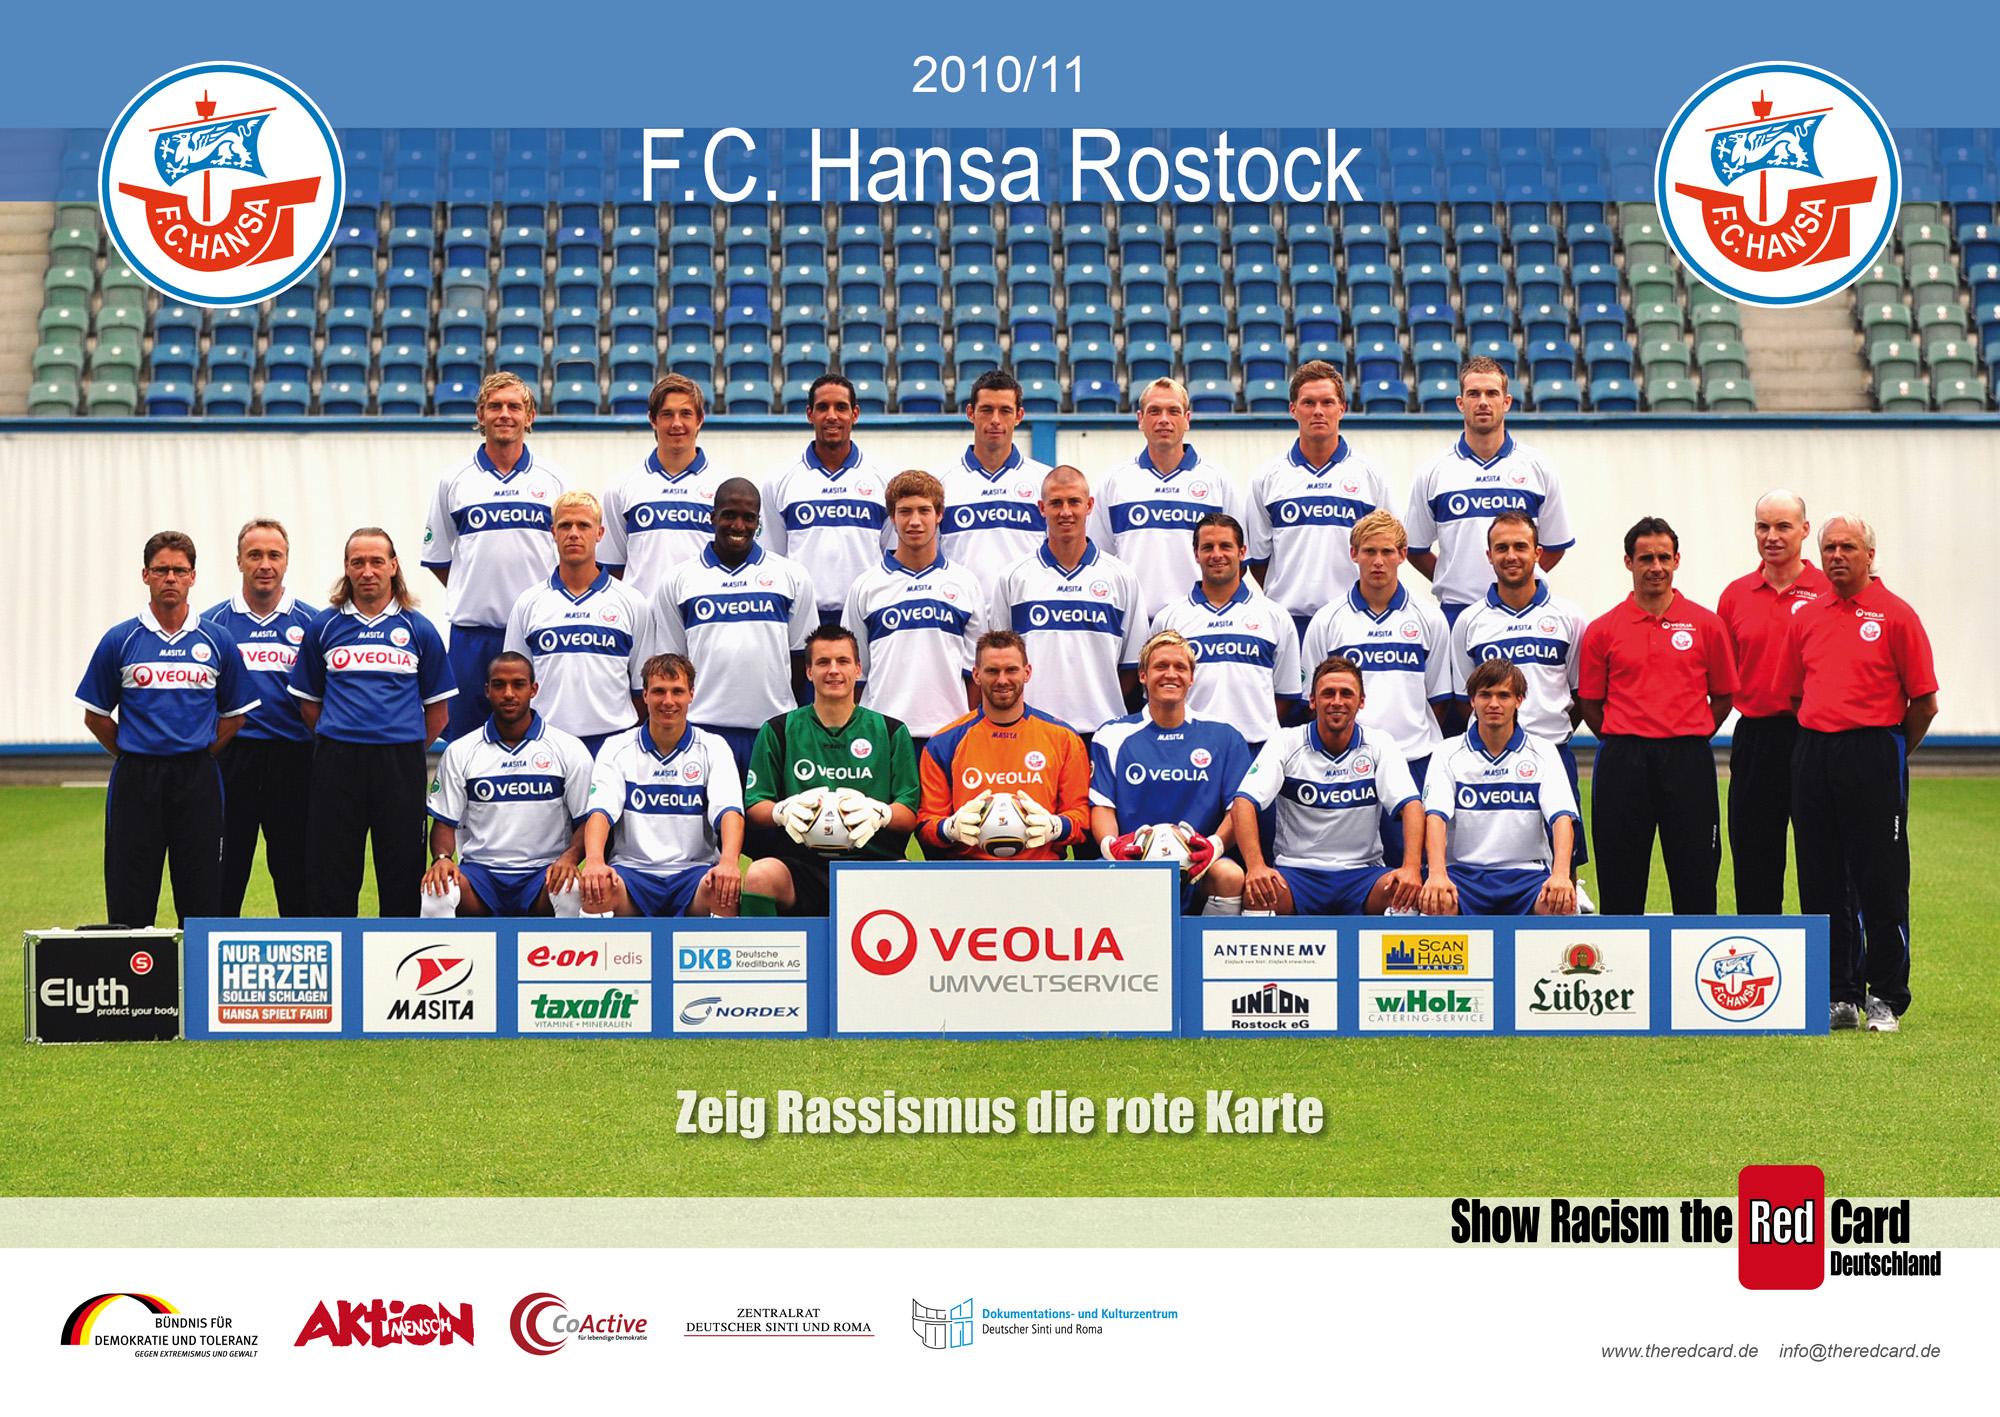 PreuГџen MГјnster Hansa Rostock